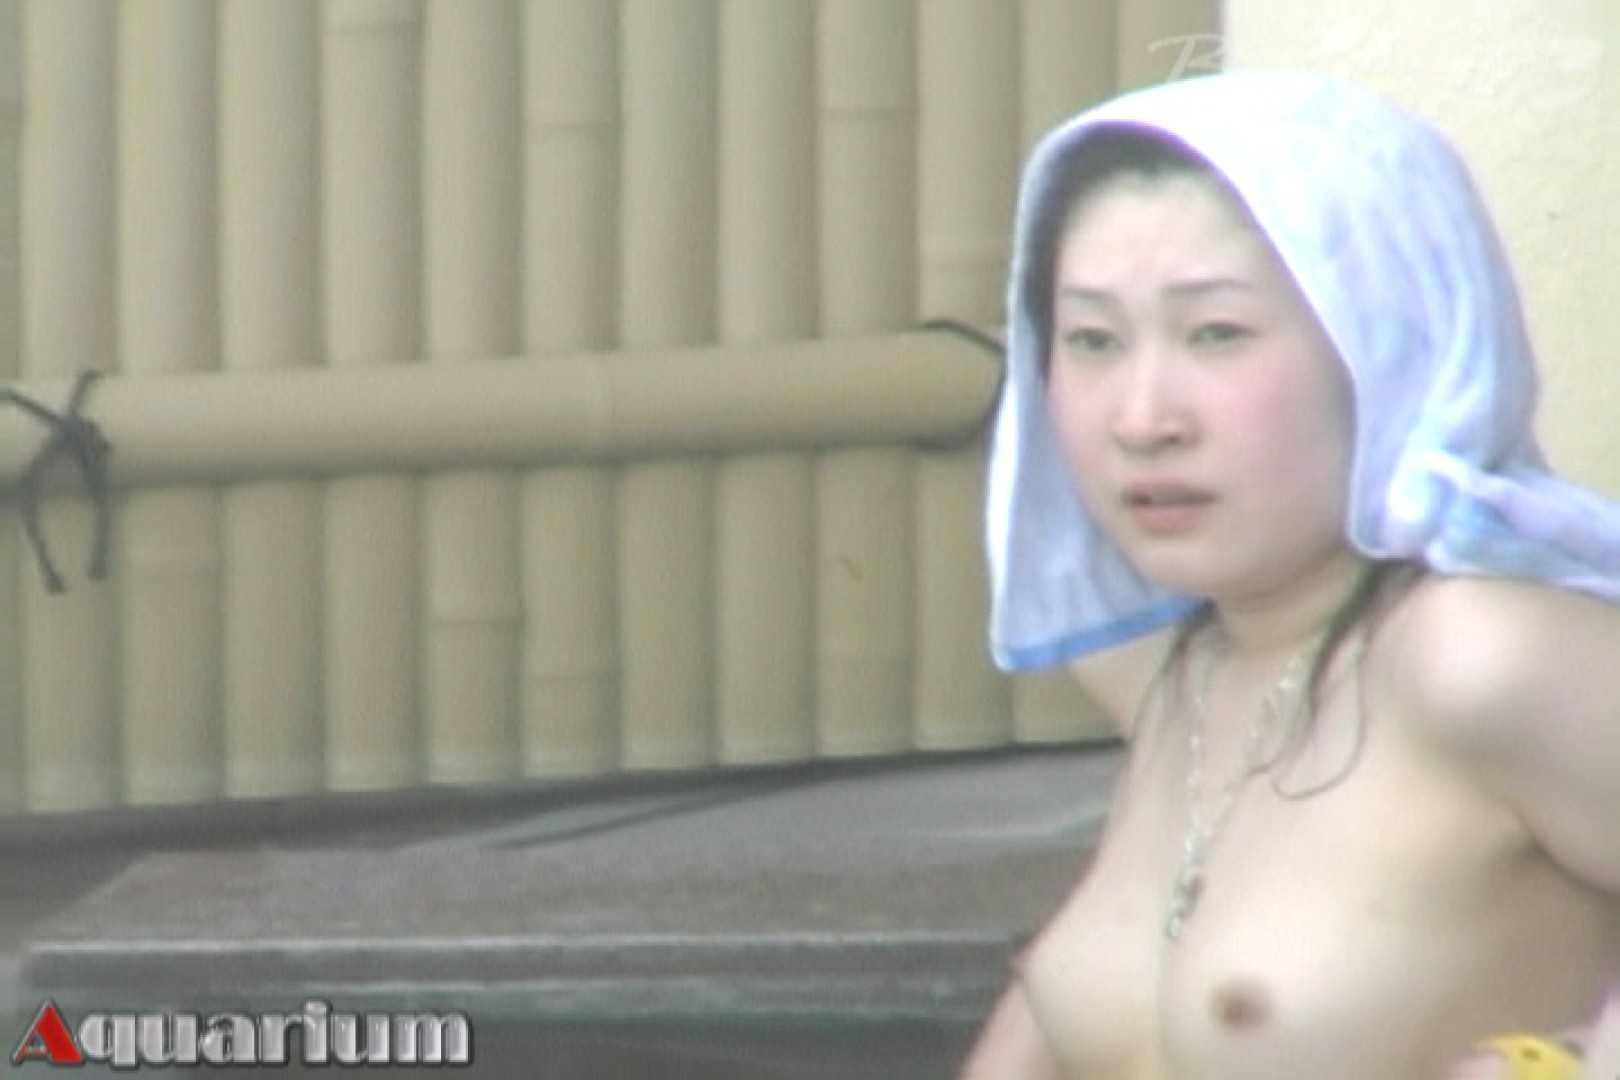 Aquaな露天風呂Vol.486 銭湯 セックス無修正動画無料 106PIX 80